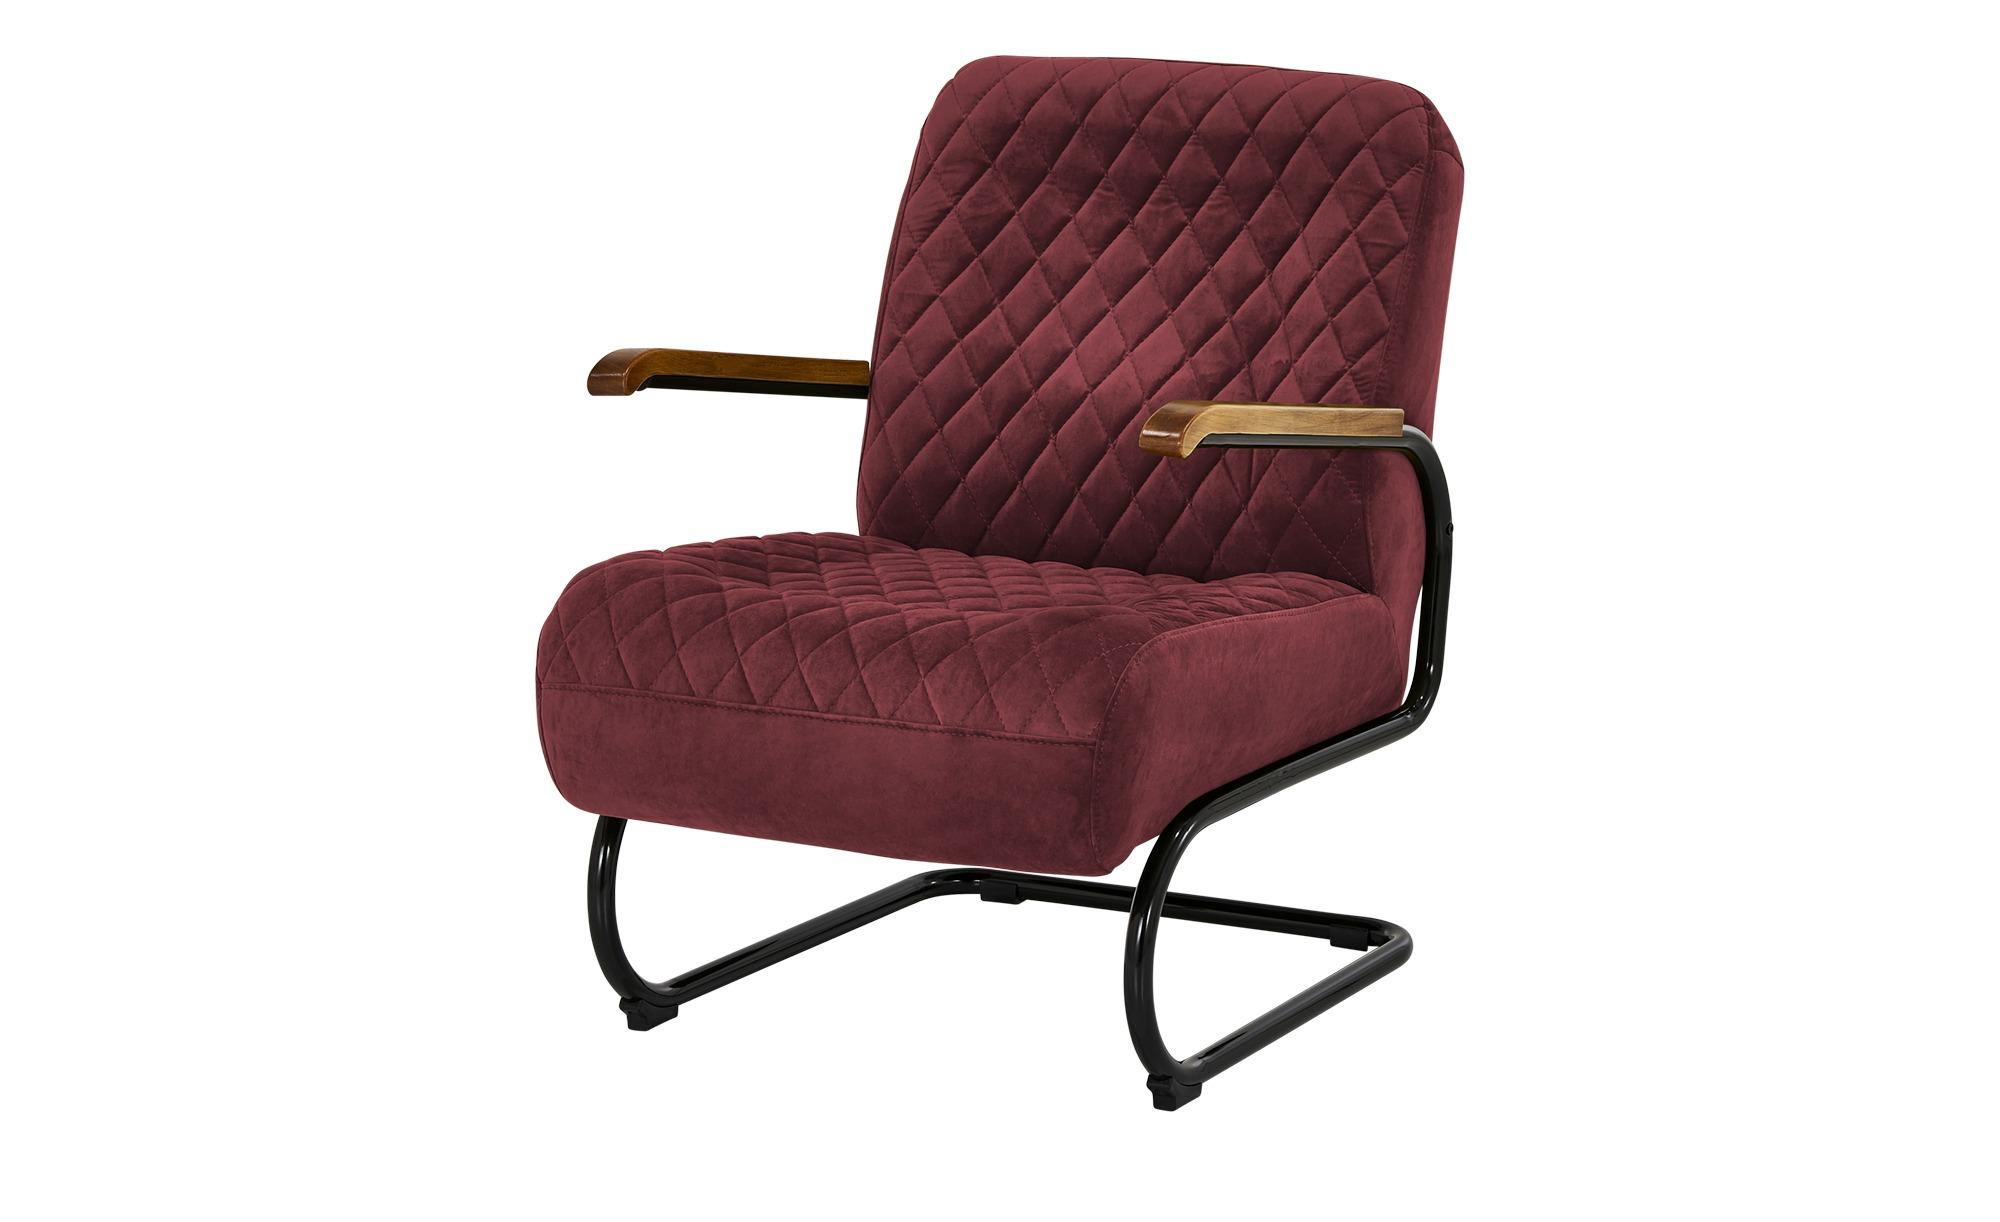 Sessel  Trudi ¦ rot ¦ Maße (cm): B: 67 H: 100 T: 83 Polstermöbel > Sessel > Polstersessel - Höffner